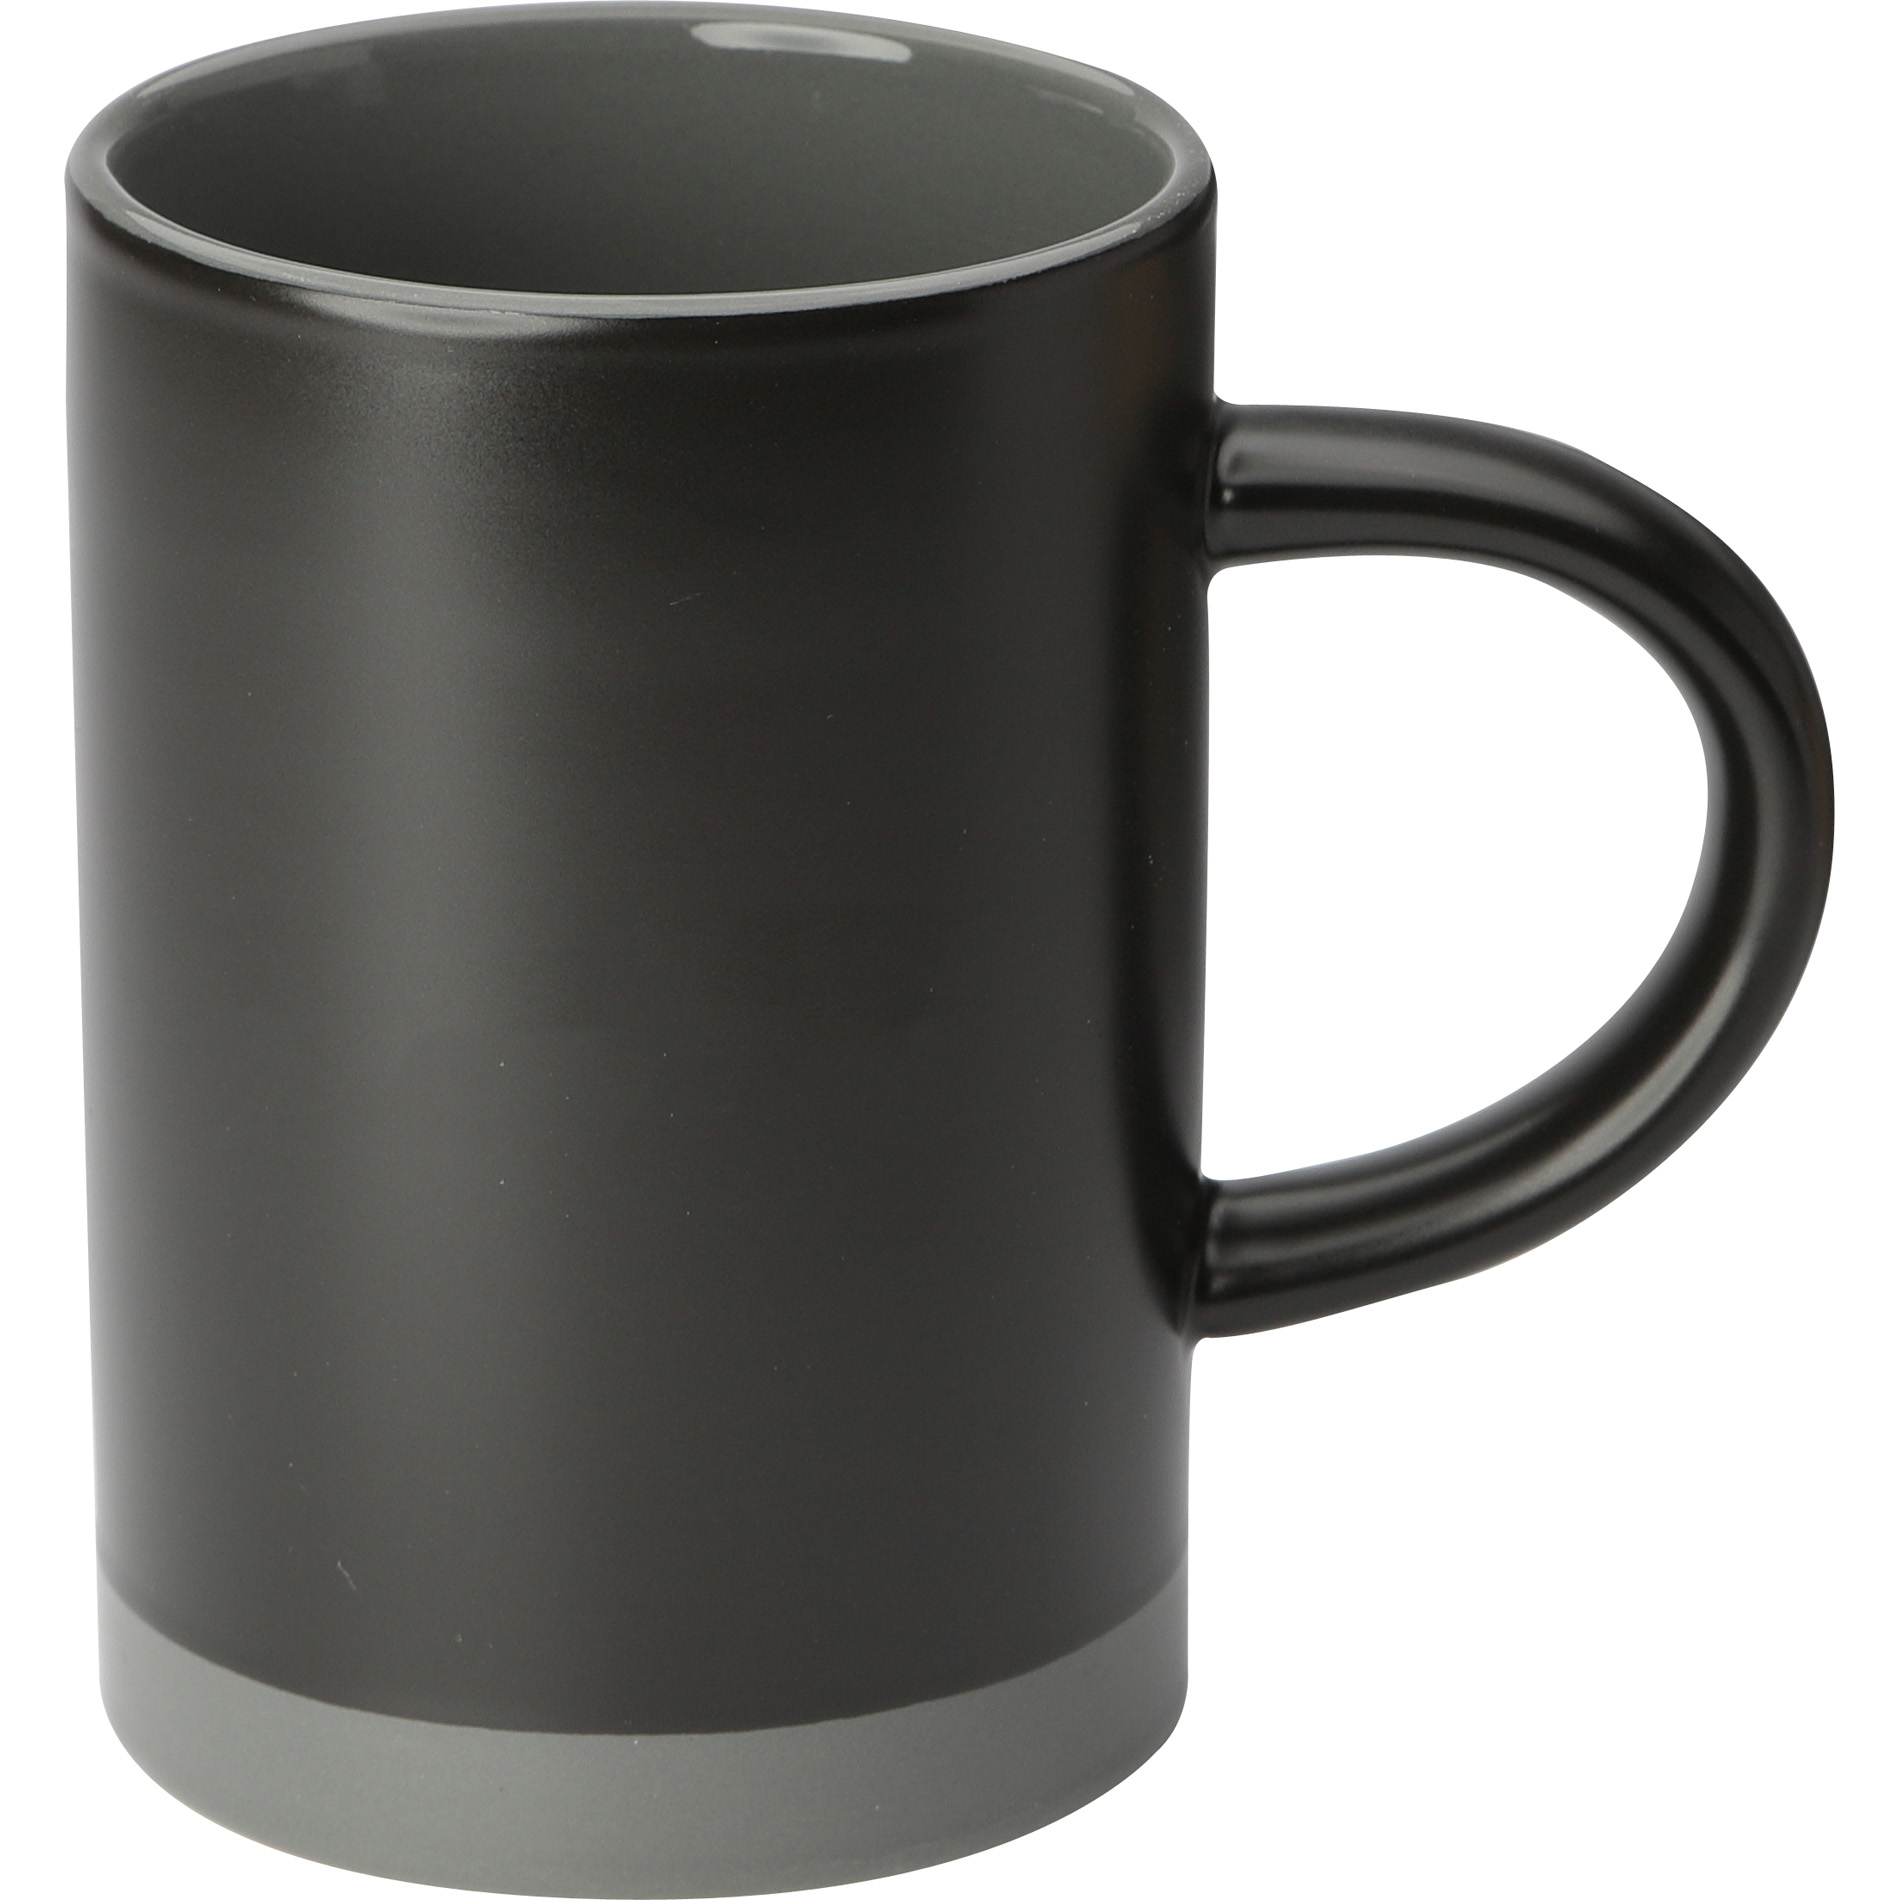 Custom 15 oz. Two-Tone Ceramic Mug